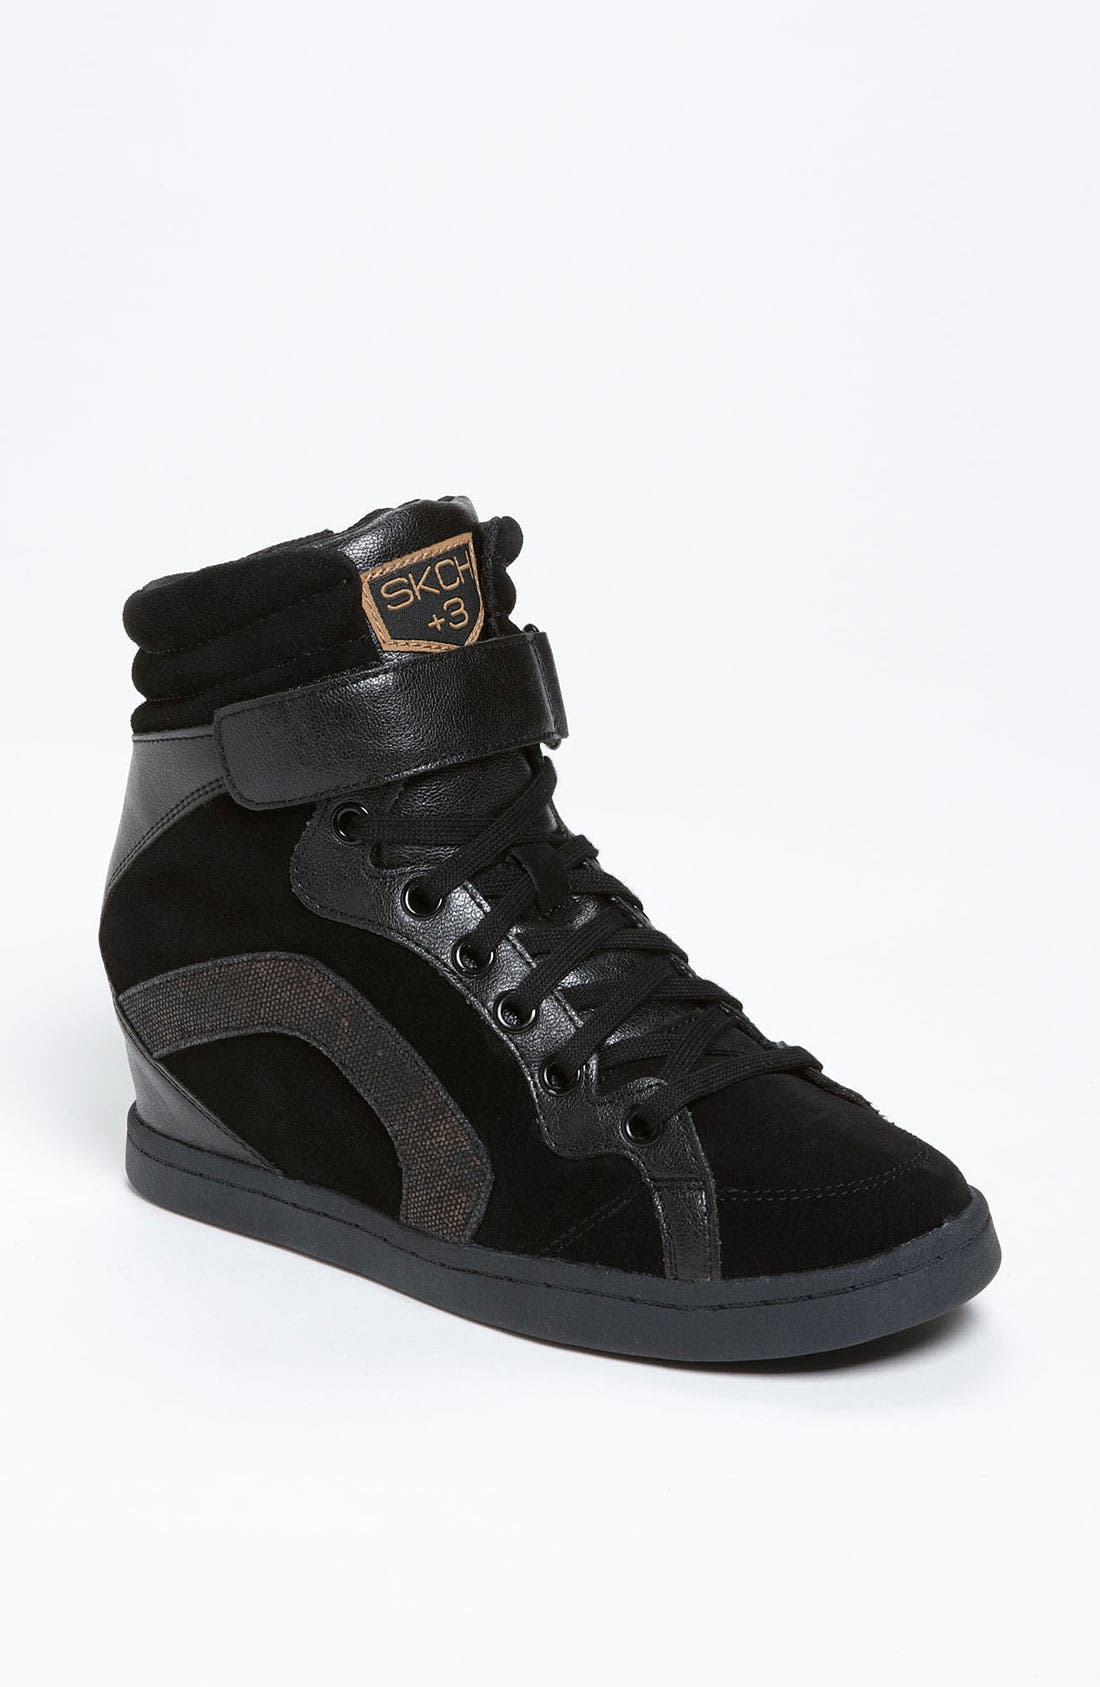 Main Image - SKECHERS 'Three Booster' Wedge Sneaker (Women)